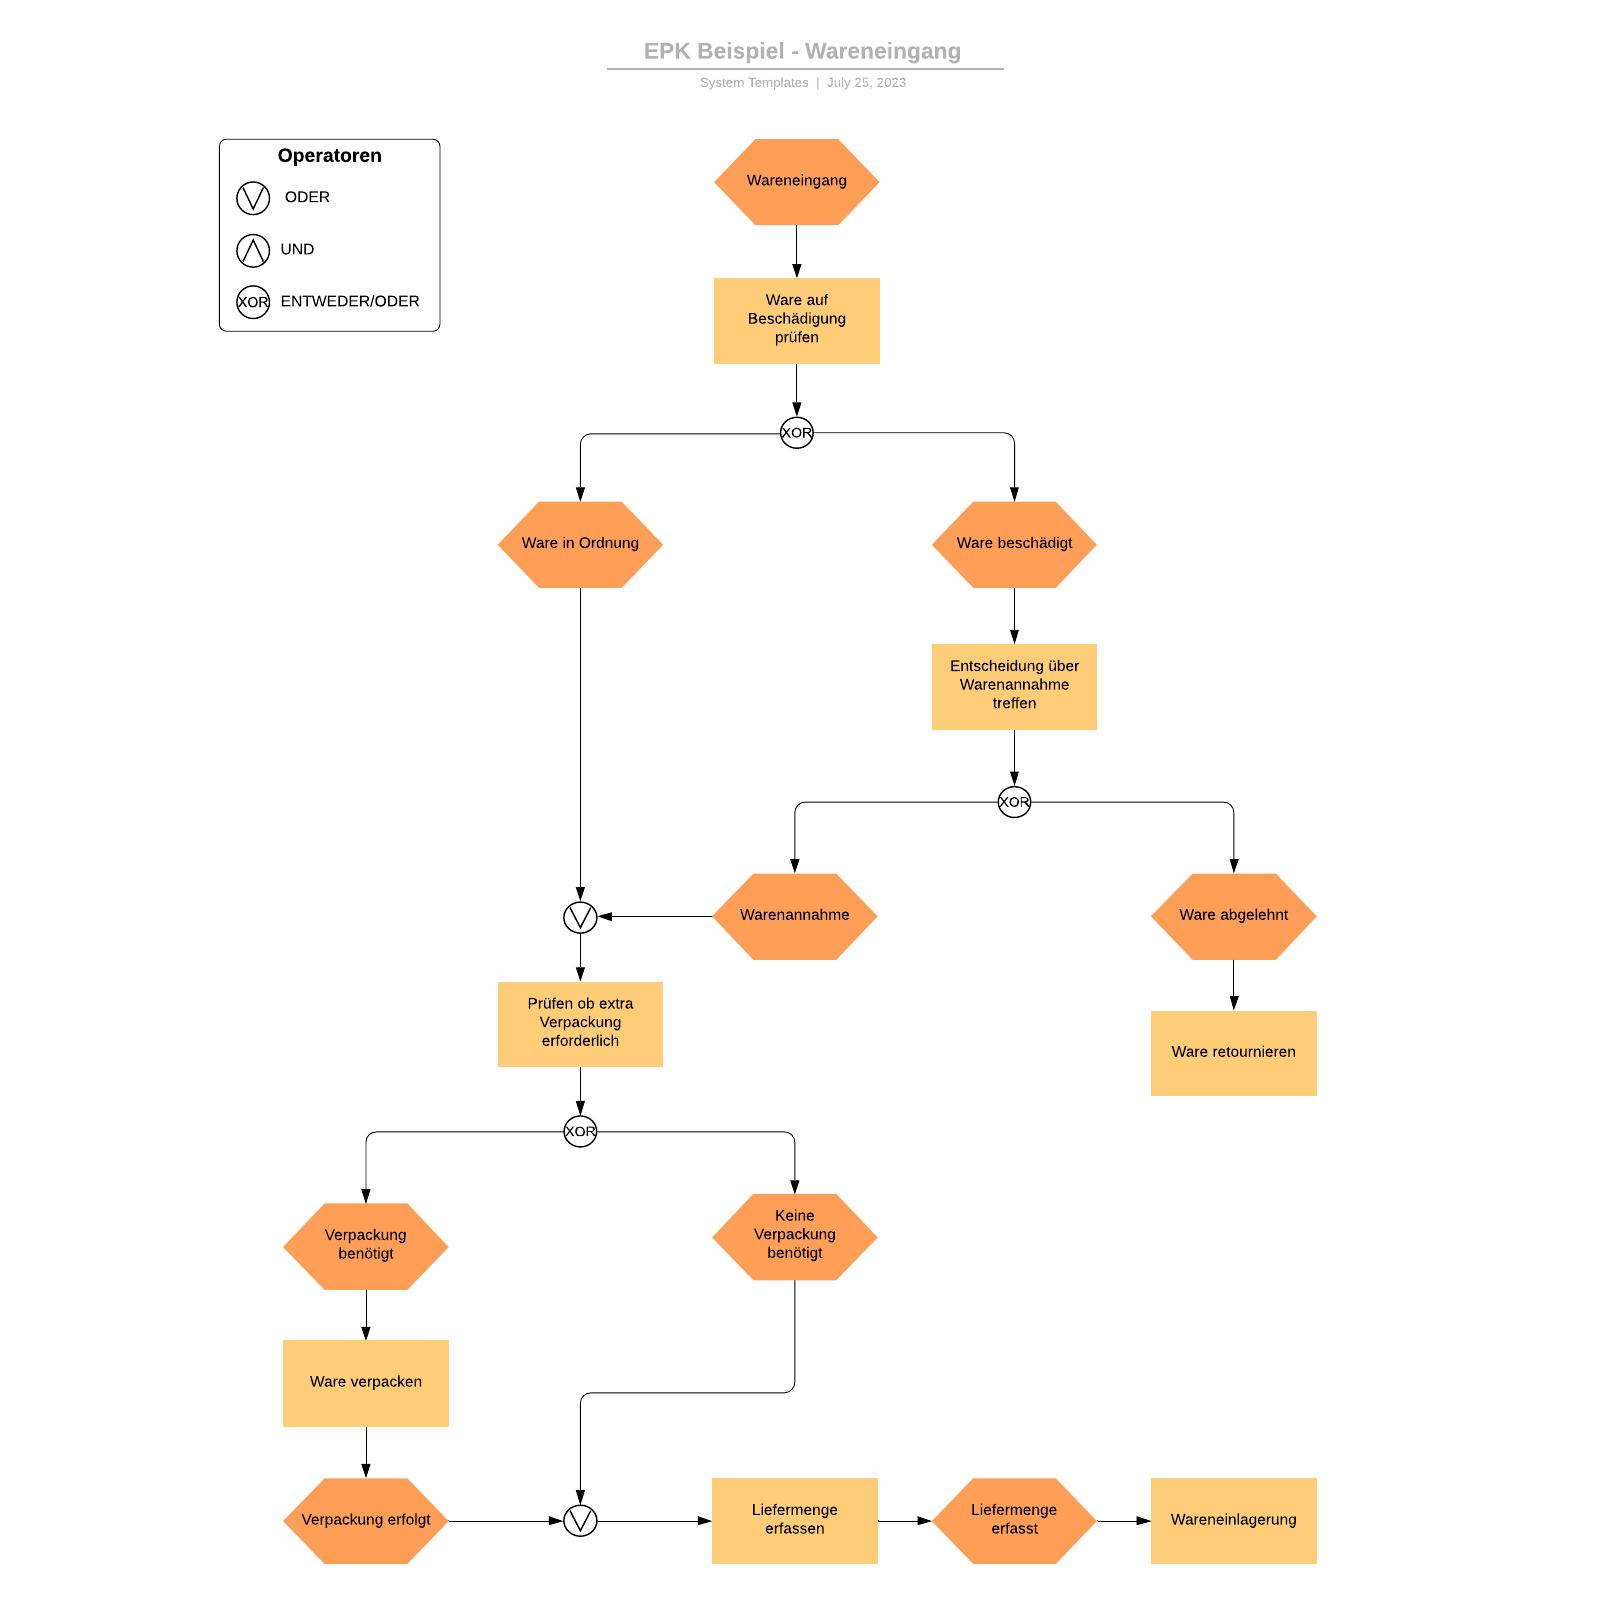 EPK Beispiel - Wareneingang